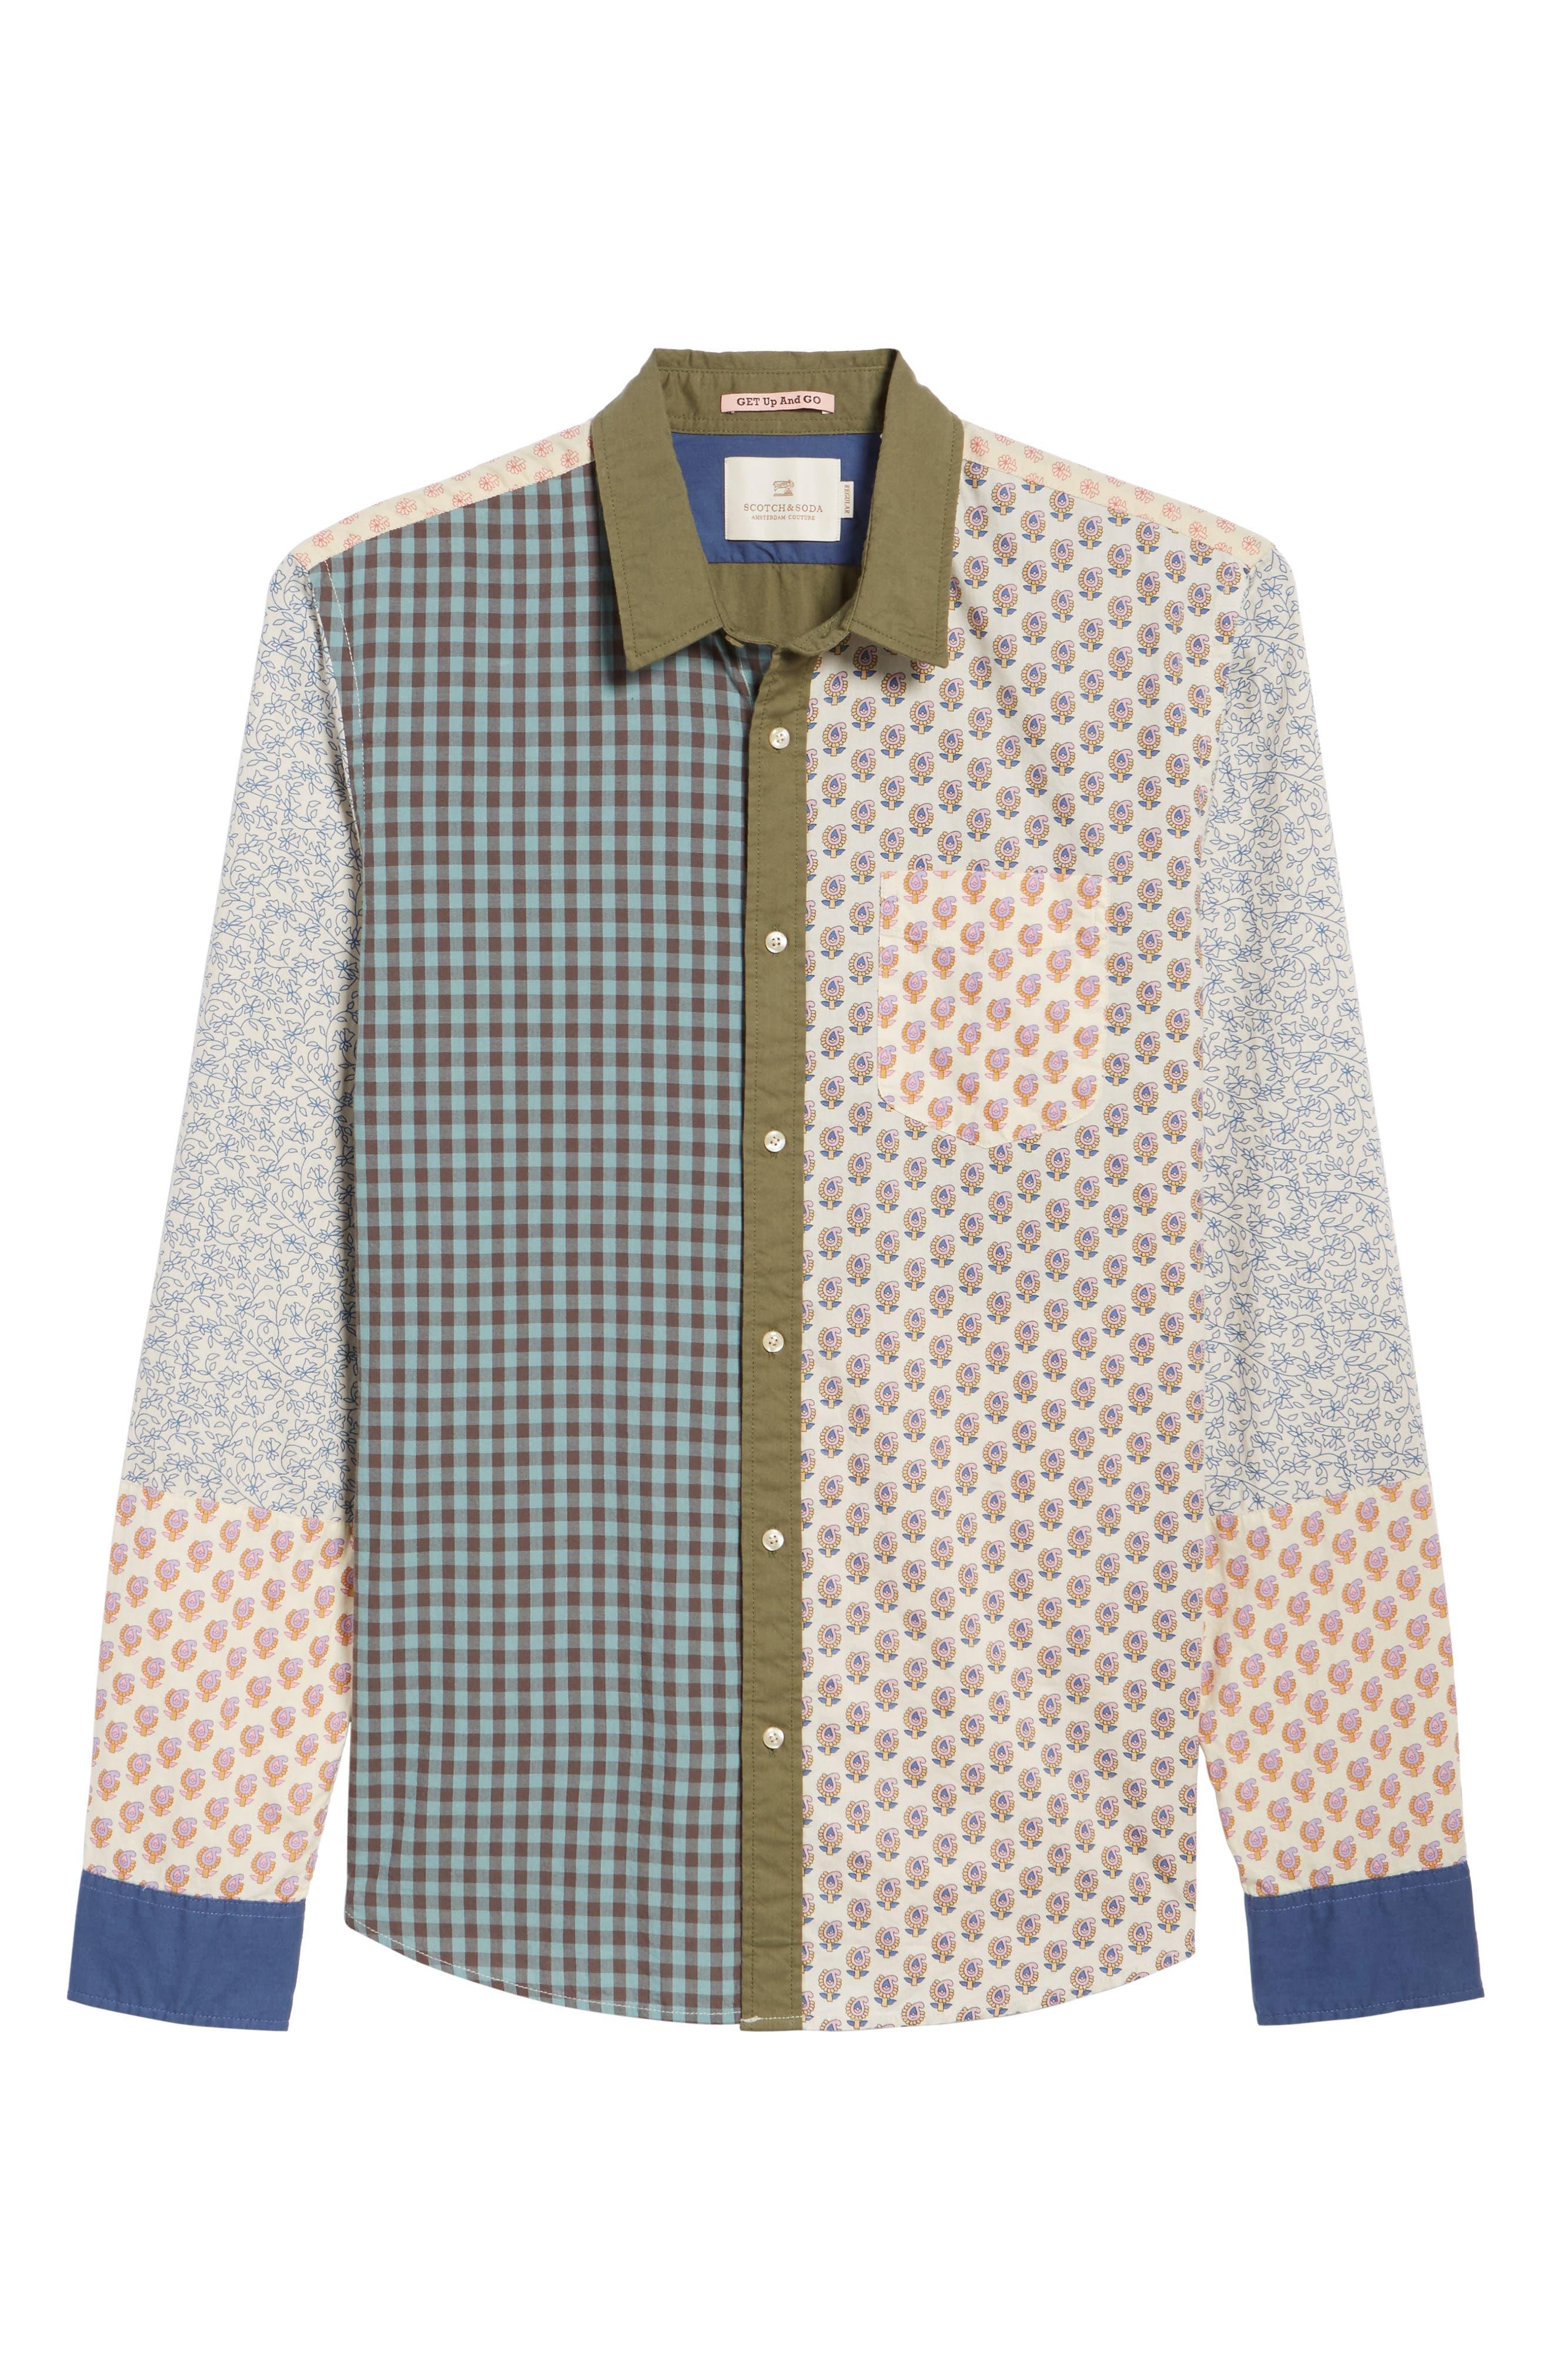 Mix & Match Sport Shirt,                             Alternate thumbnail 6, color,                             100